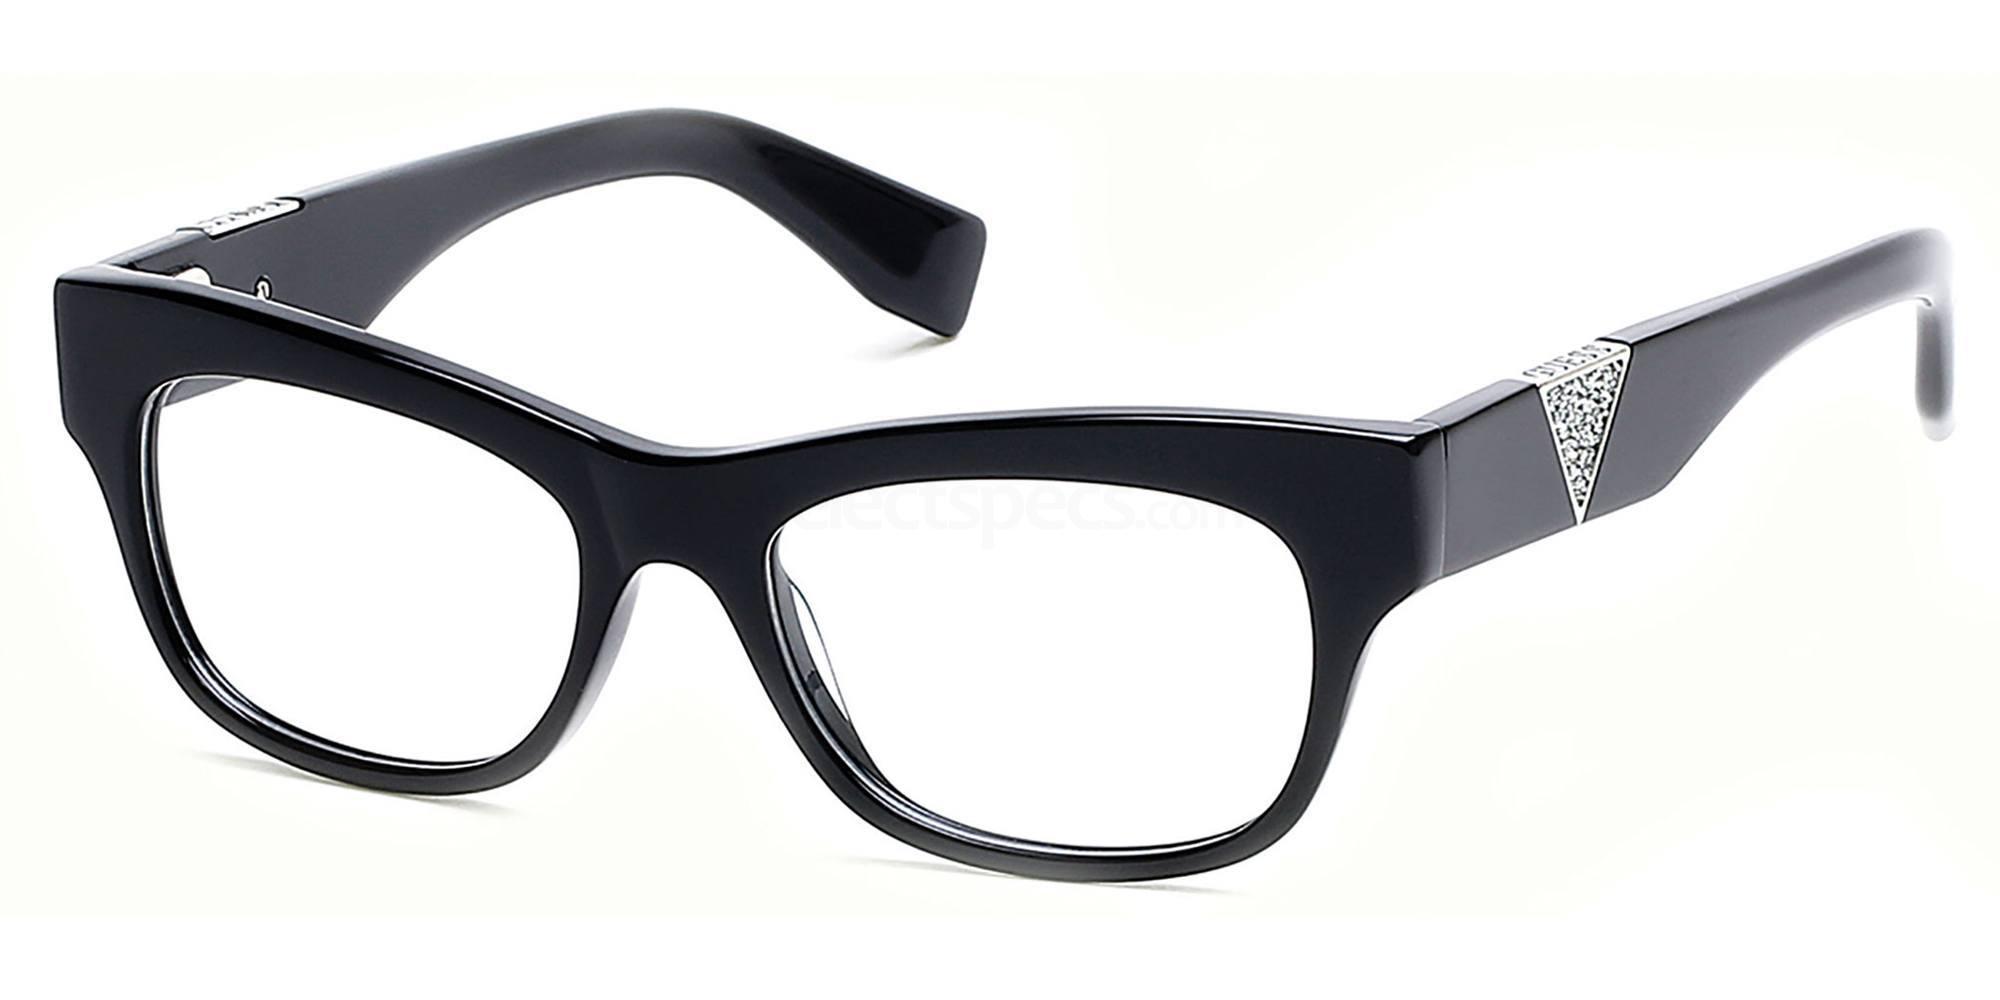 001 GU2575 Glasses, Guess